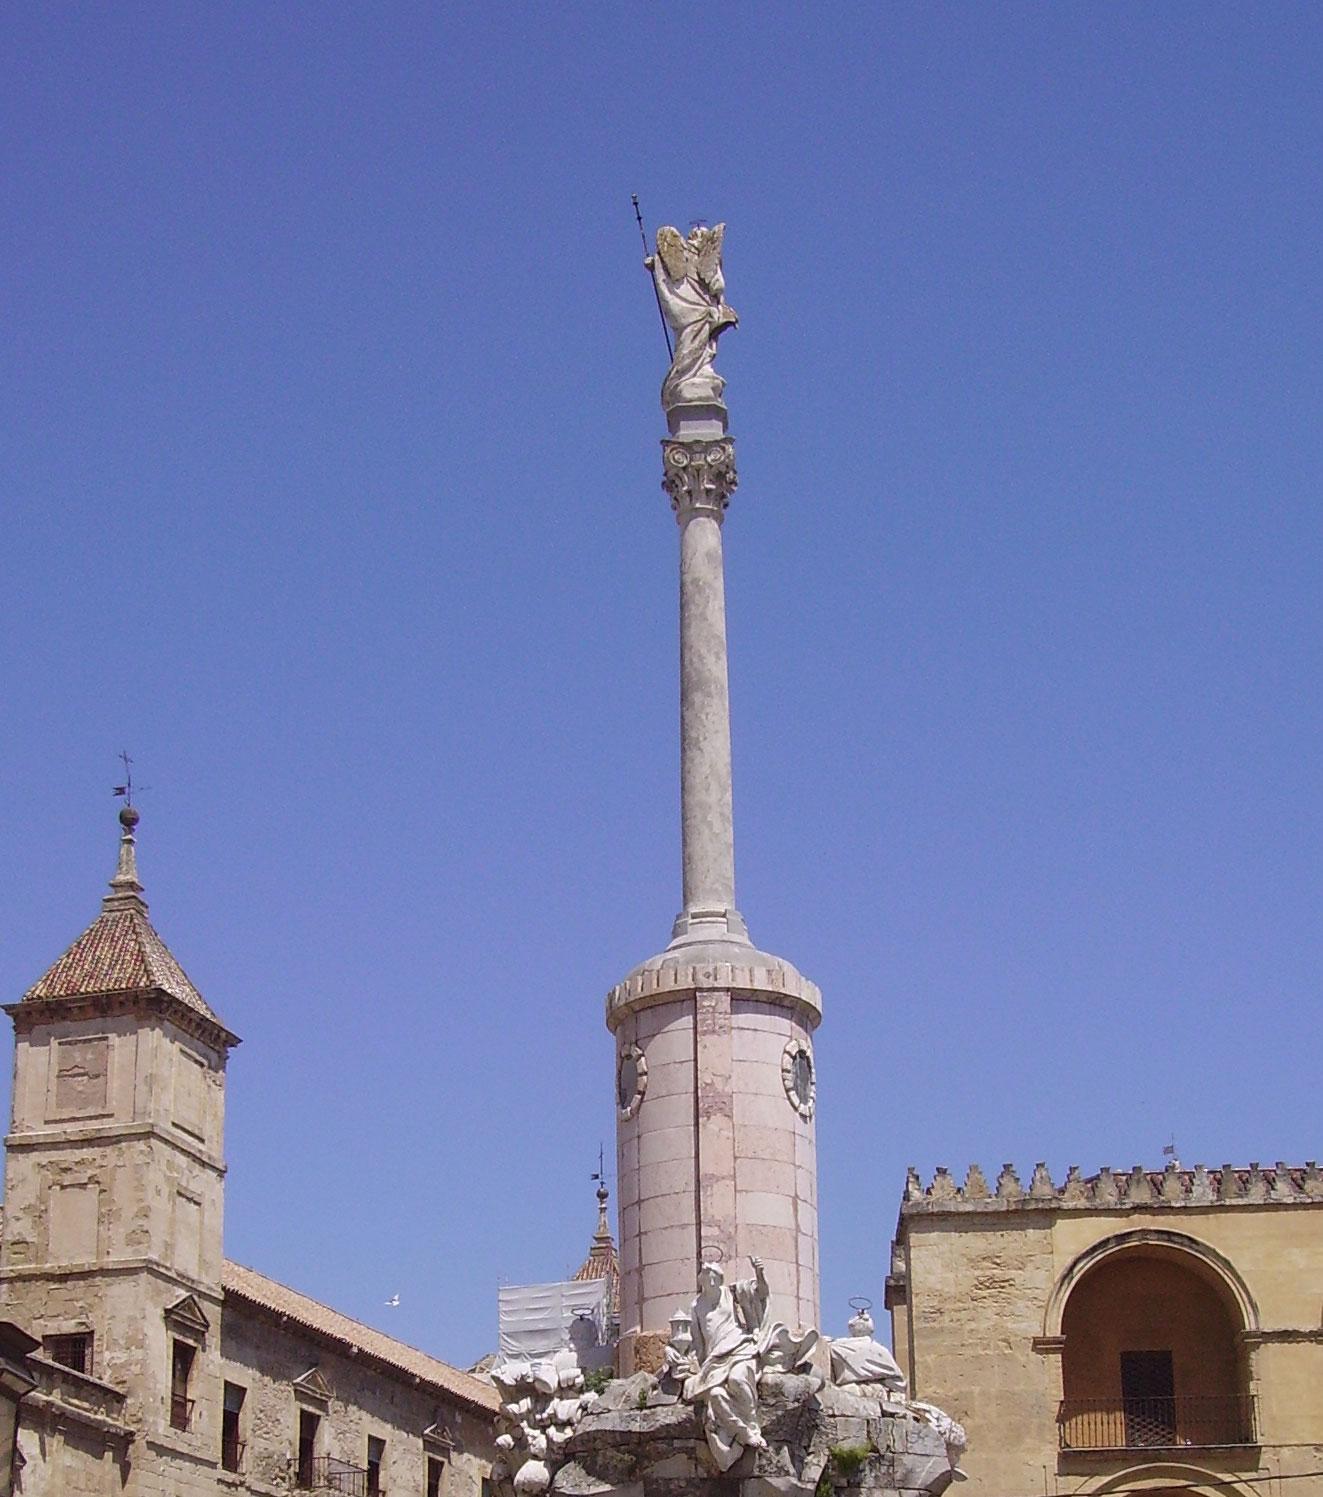 El triunfo de San Rafael - Córdoba - Eventour